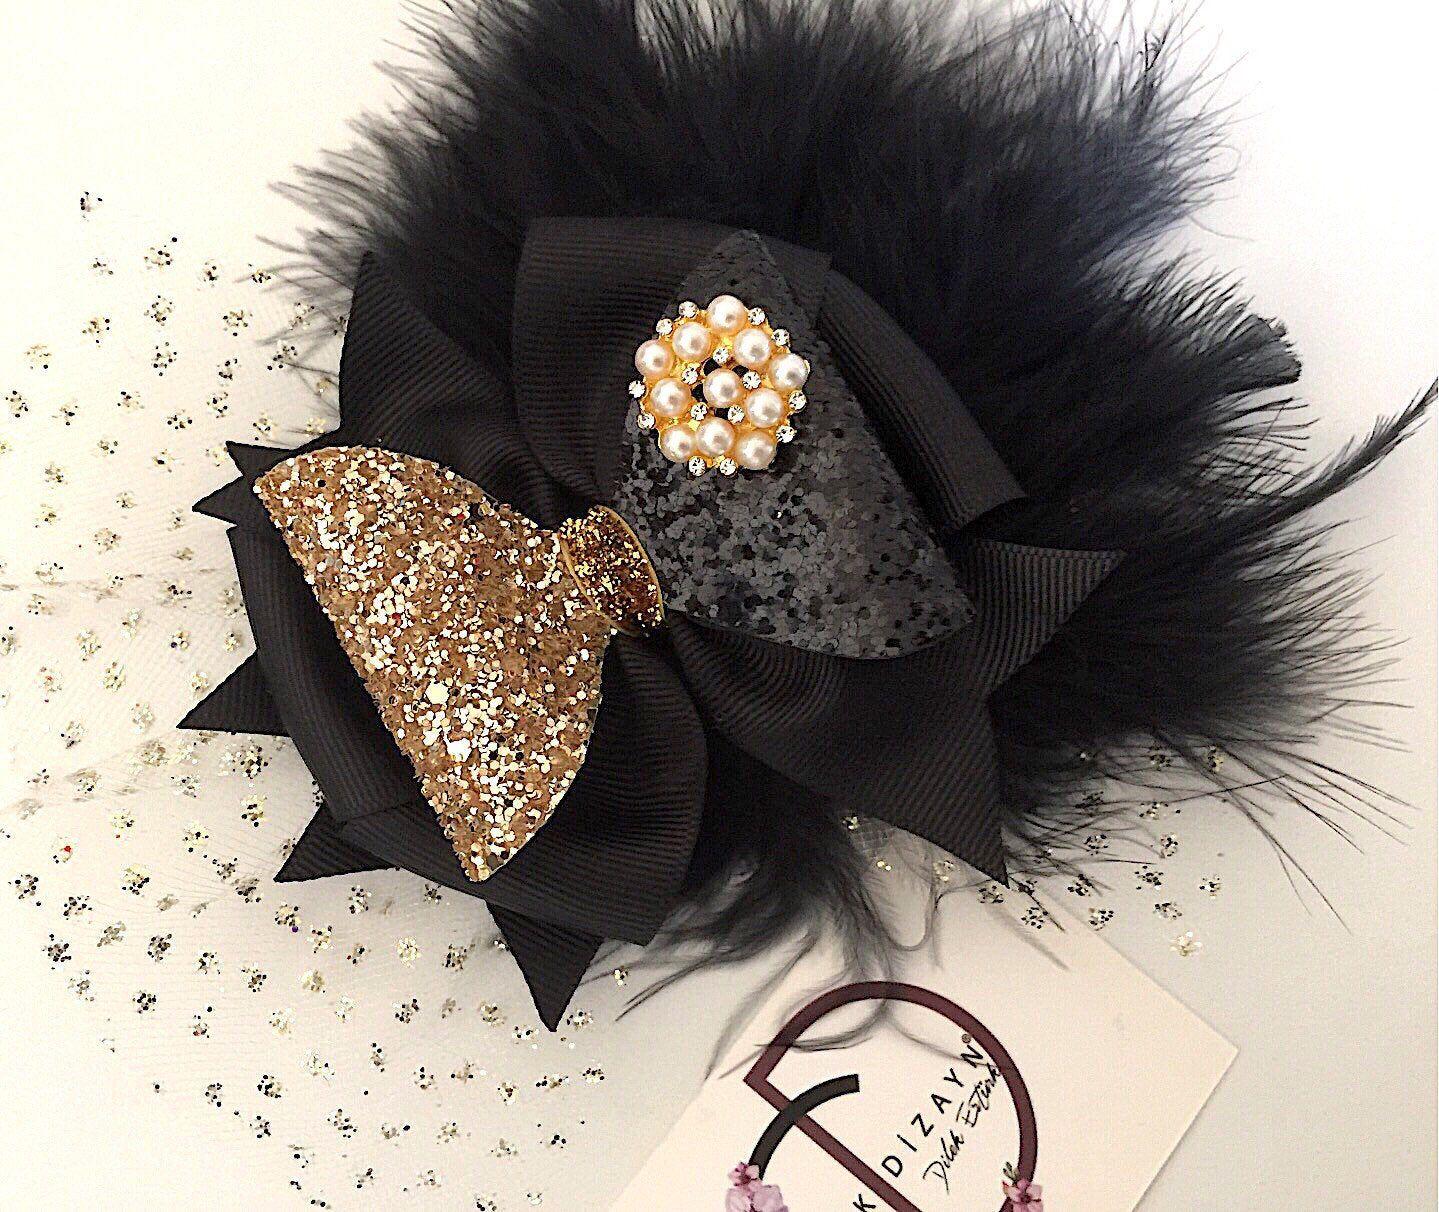 Baby Girl Gift Hair Accessories Newborn Headband Black Hair Bow Baby Headband Black Glitter Bow Baby Bows Baby Hair Clip Hair Bows